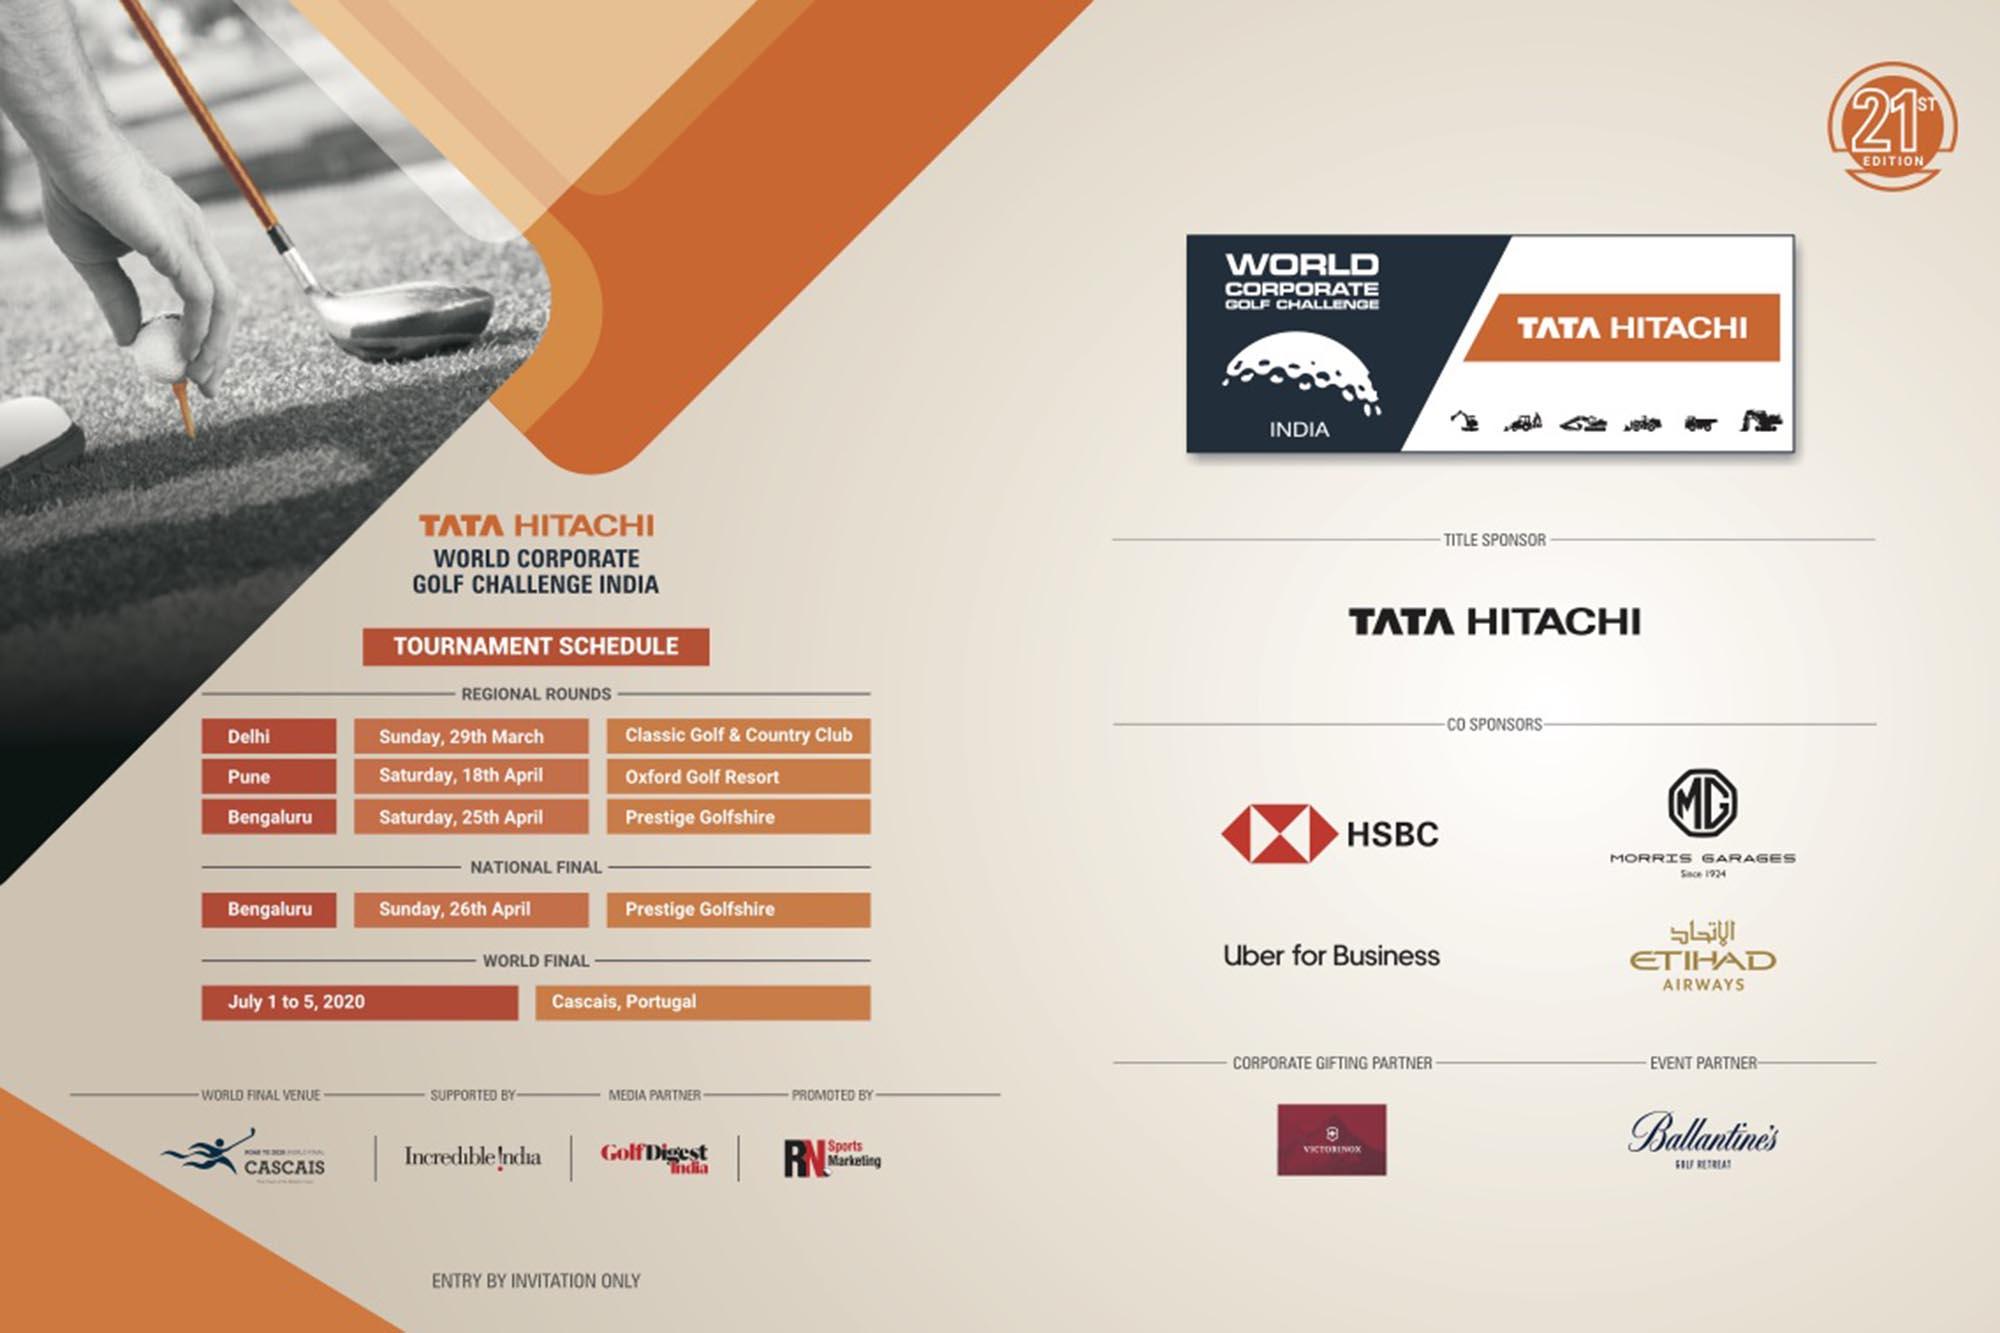 WCGC India 2020 season